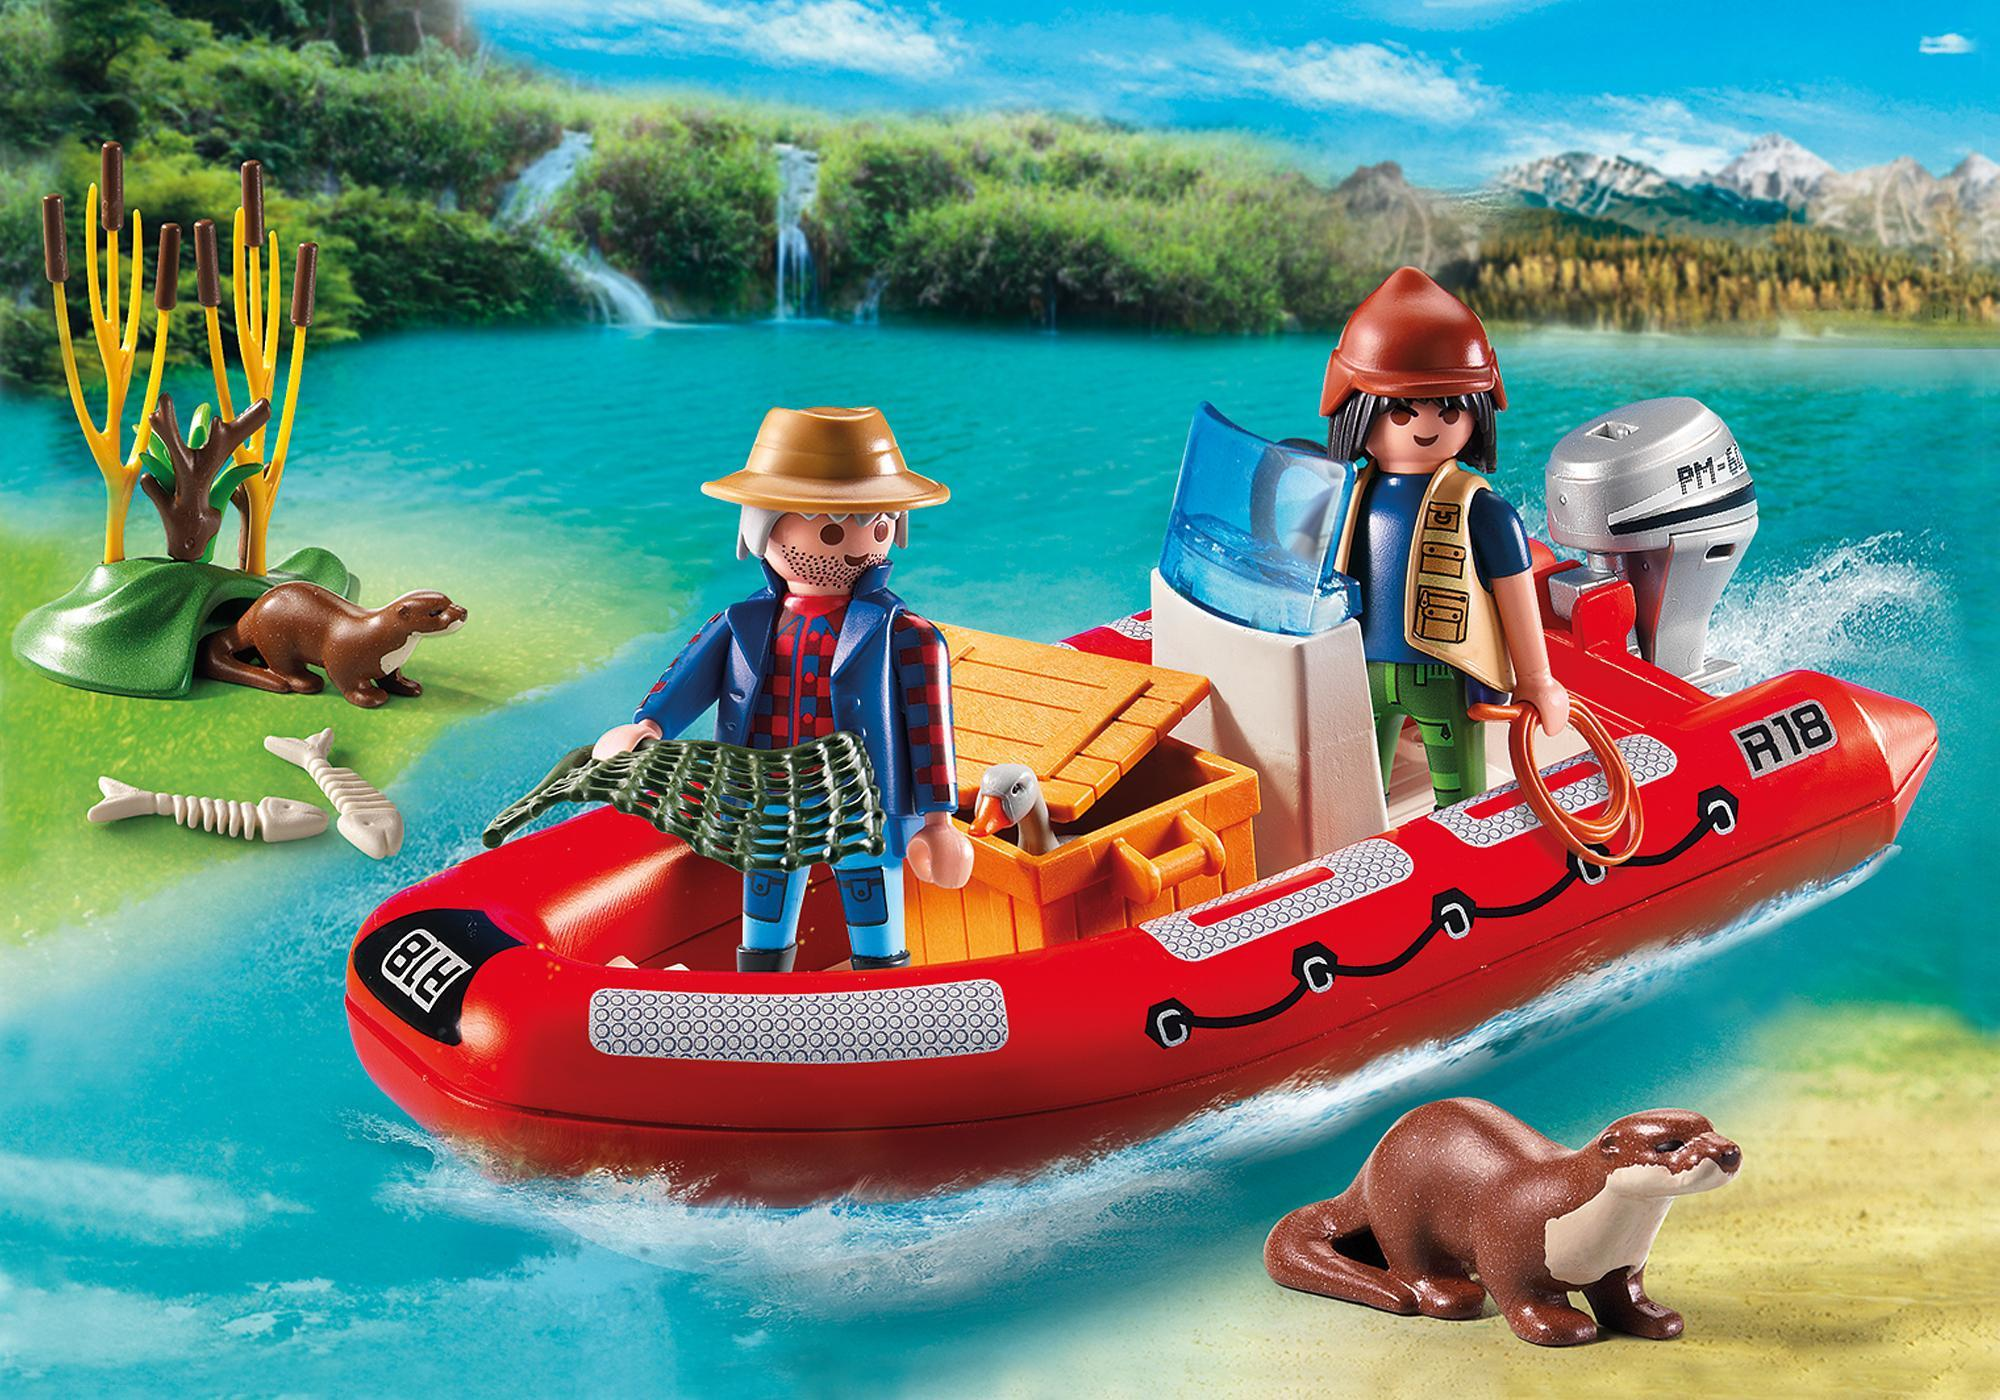 http://media.playmobil.com/i/playmobil/5559_product_detail/Rubberboot met stropers